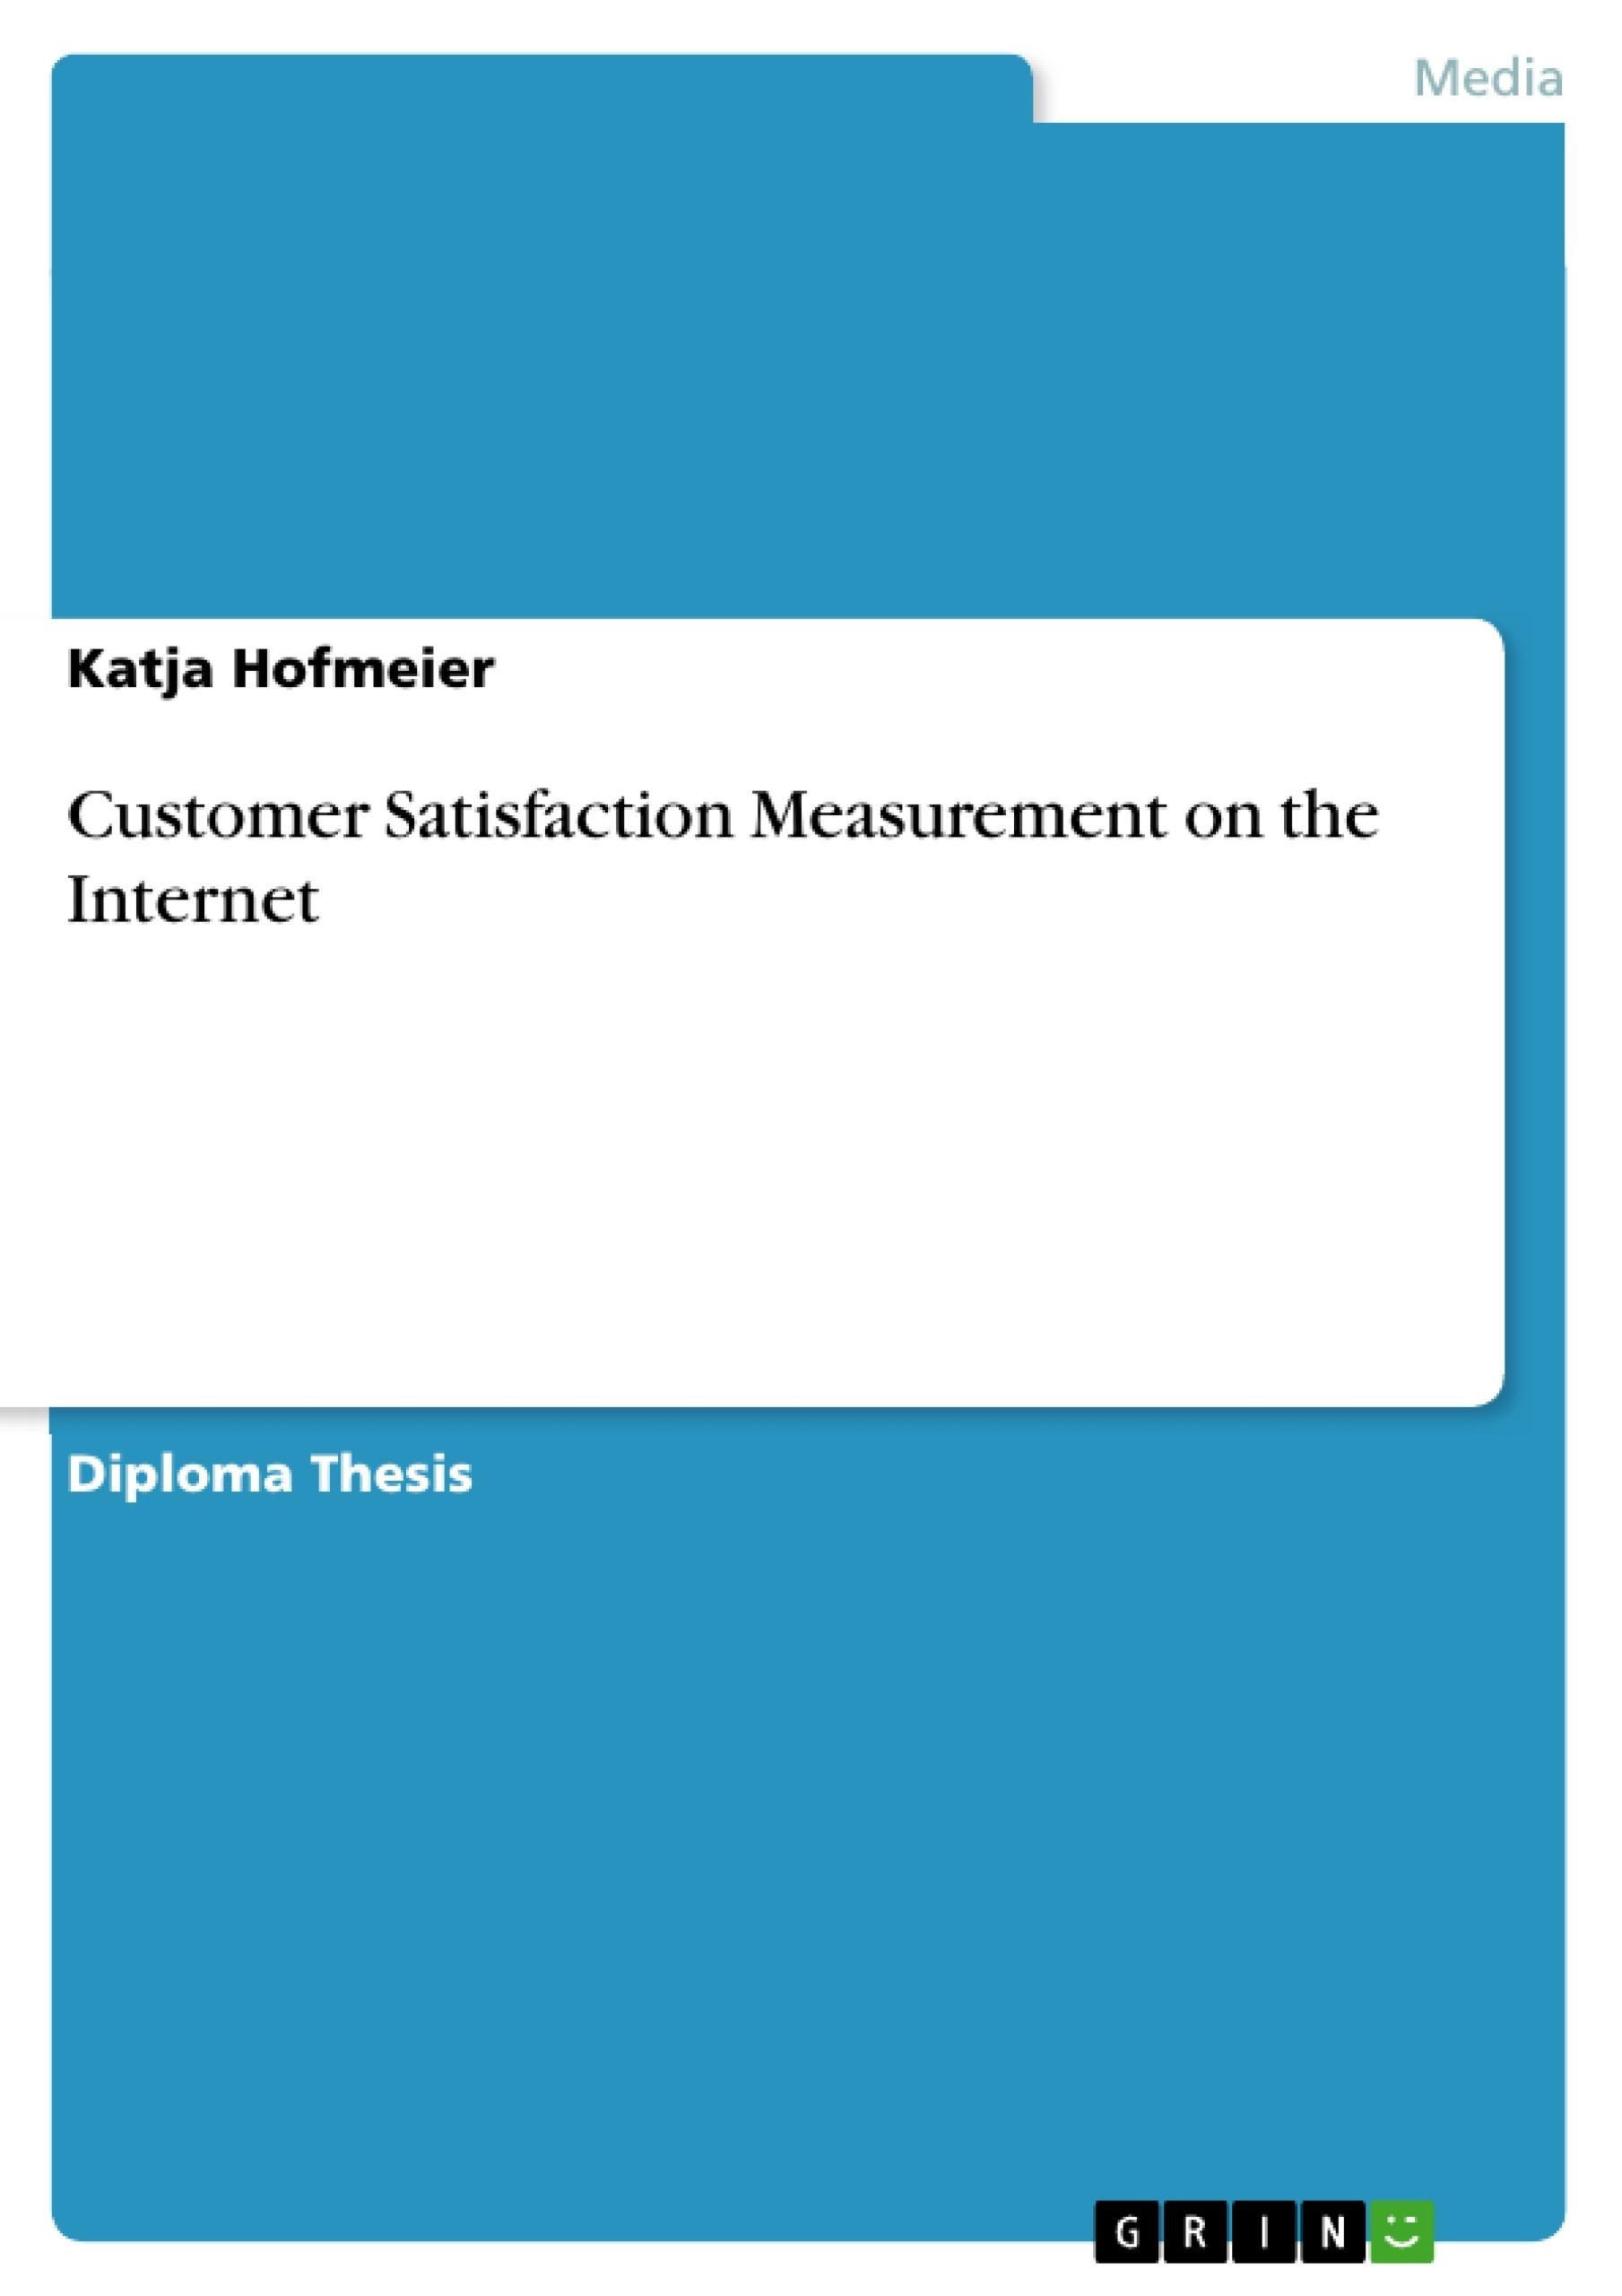 Title: Customer Satisfaction Measurement on the Internet